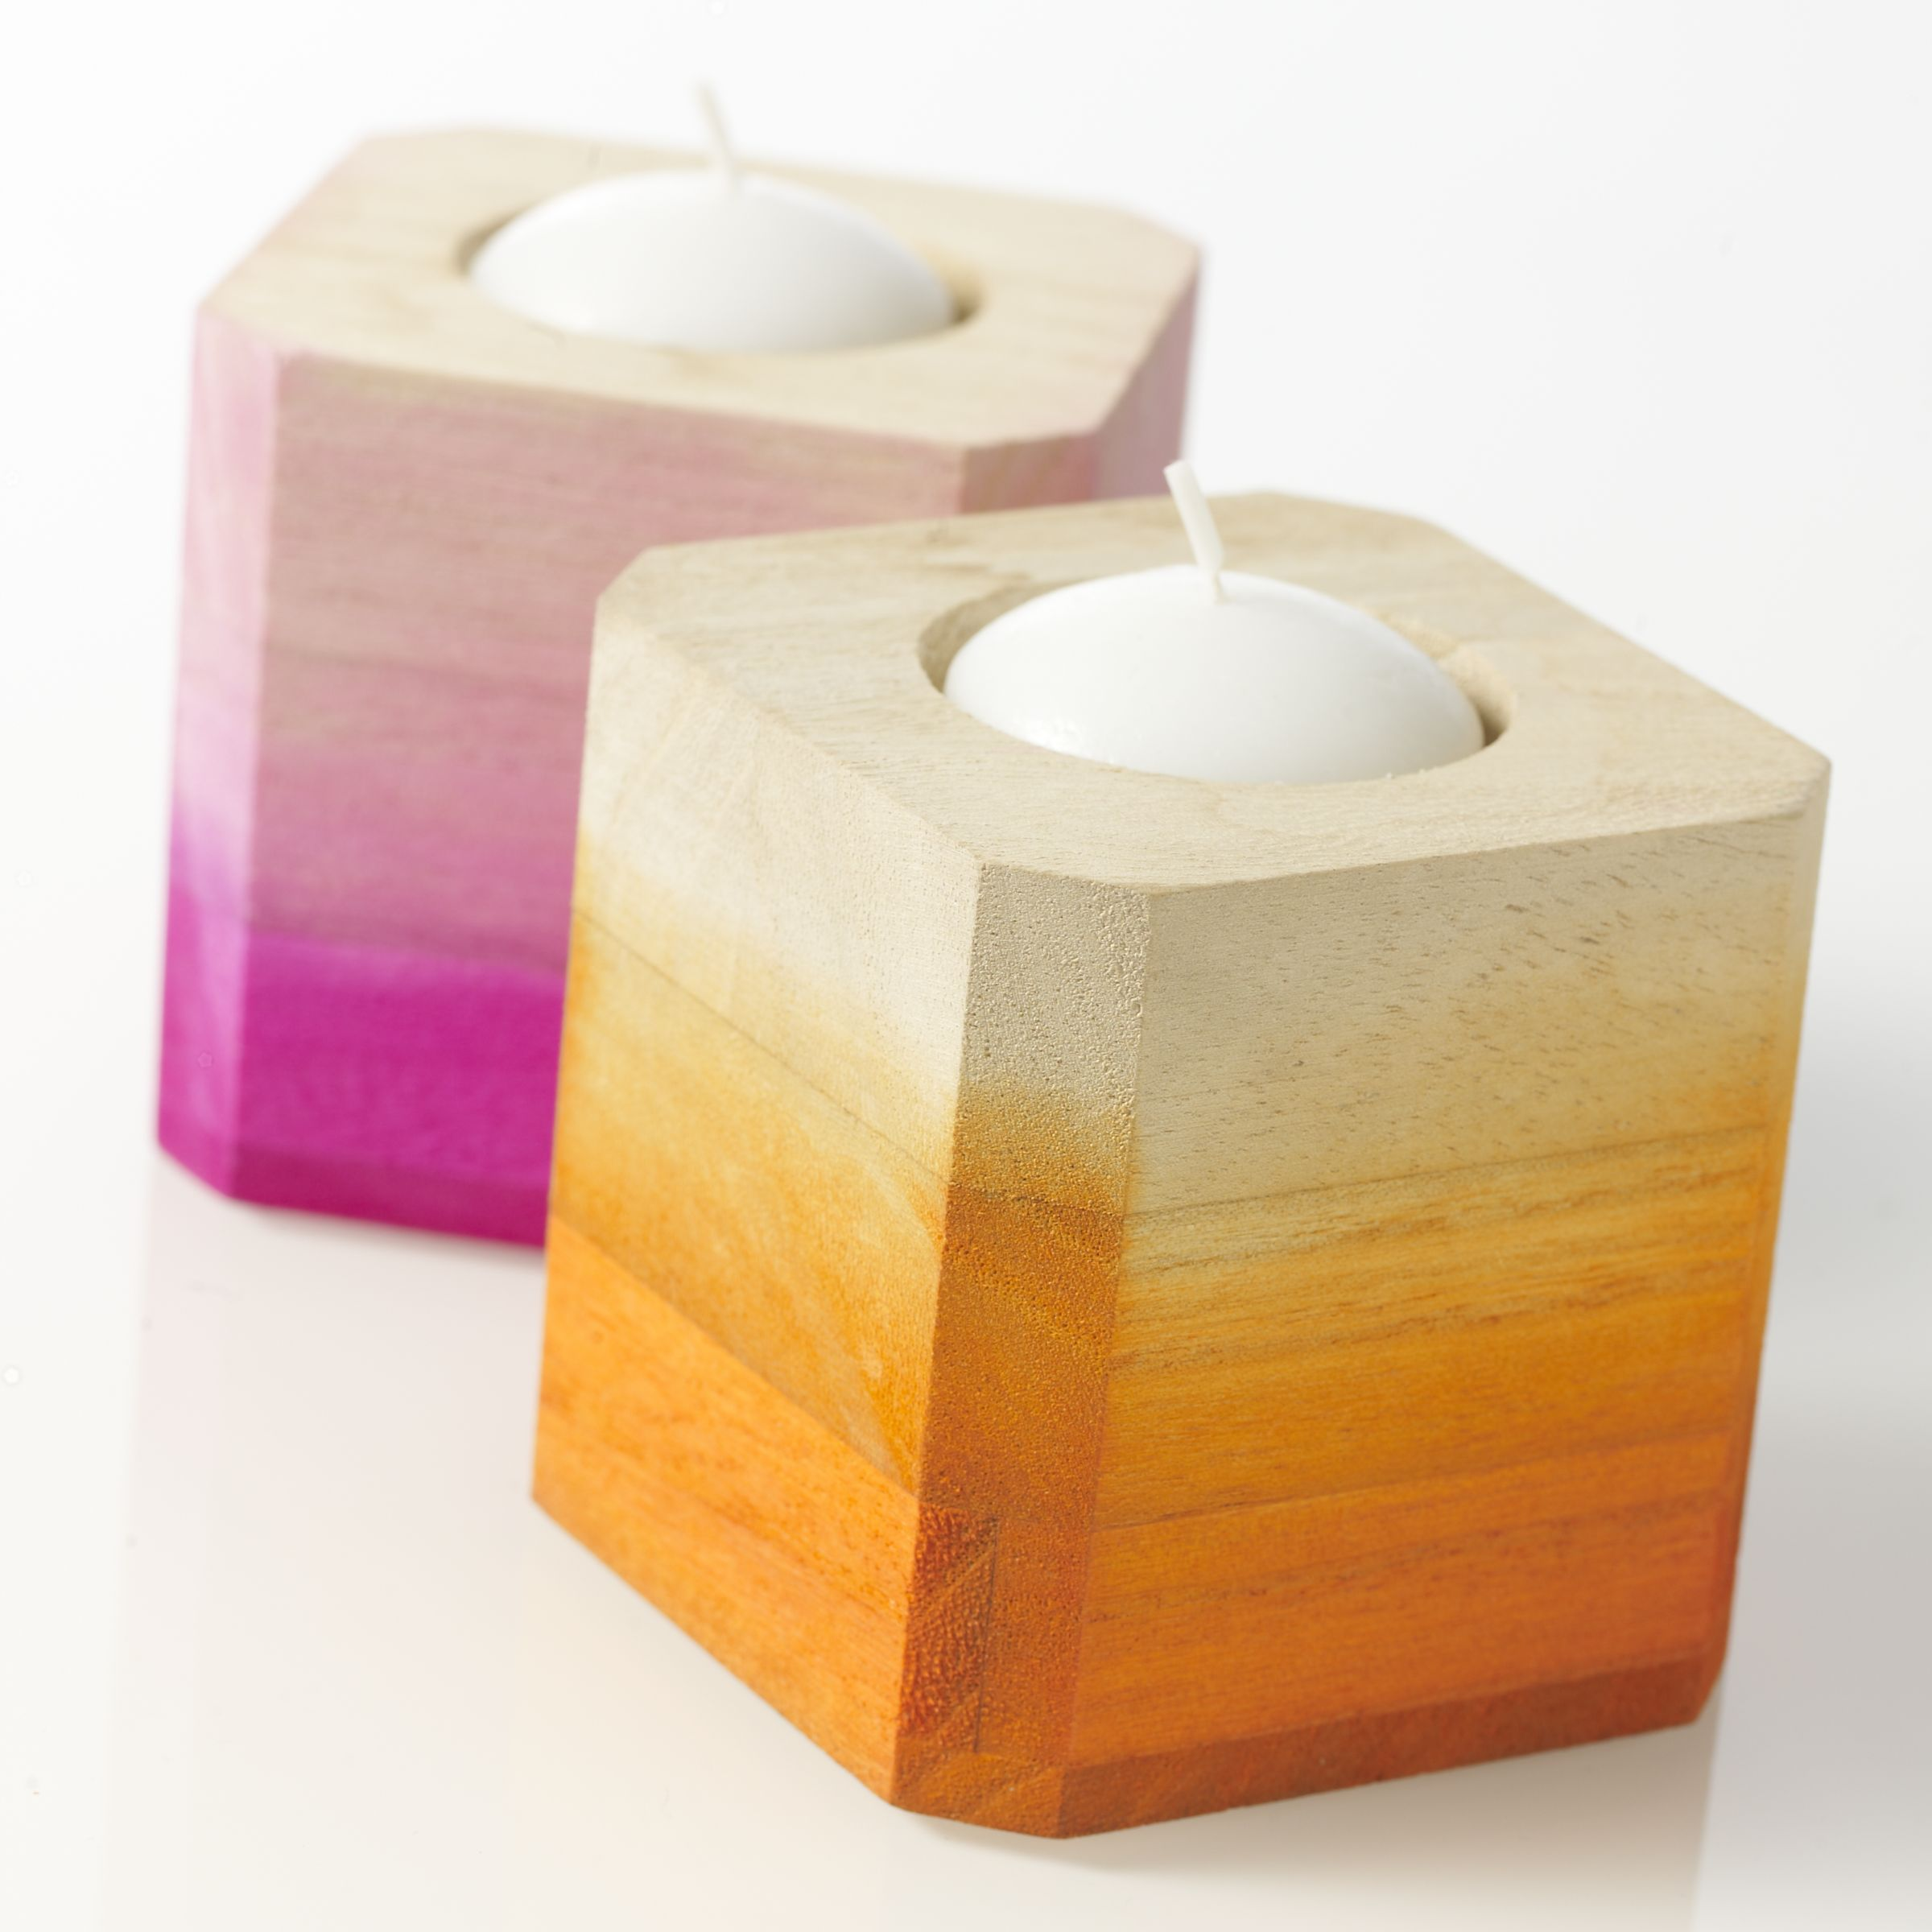 FolkArt ® Ultra Dye™ Colors - Pucker Up, 8 oz. - 5601